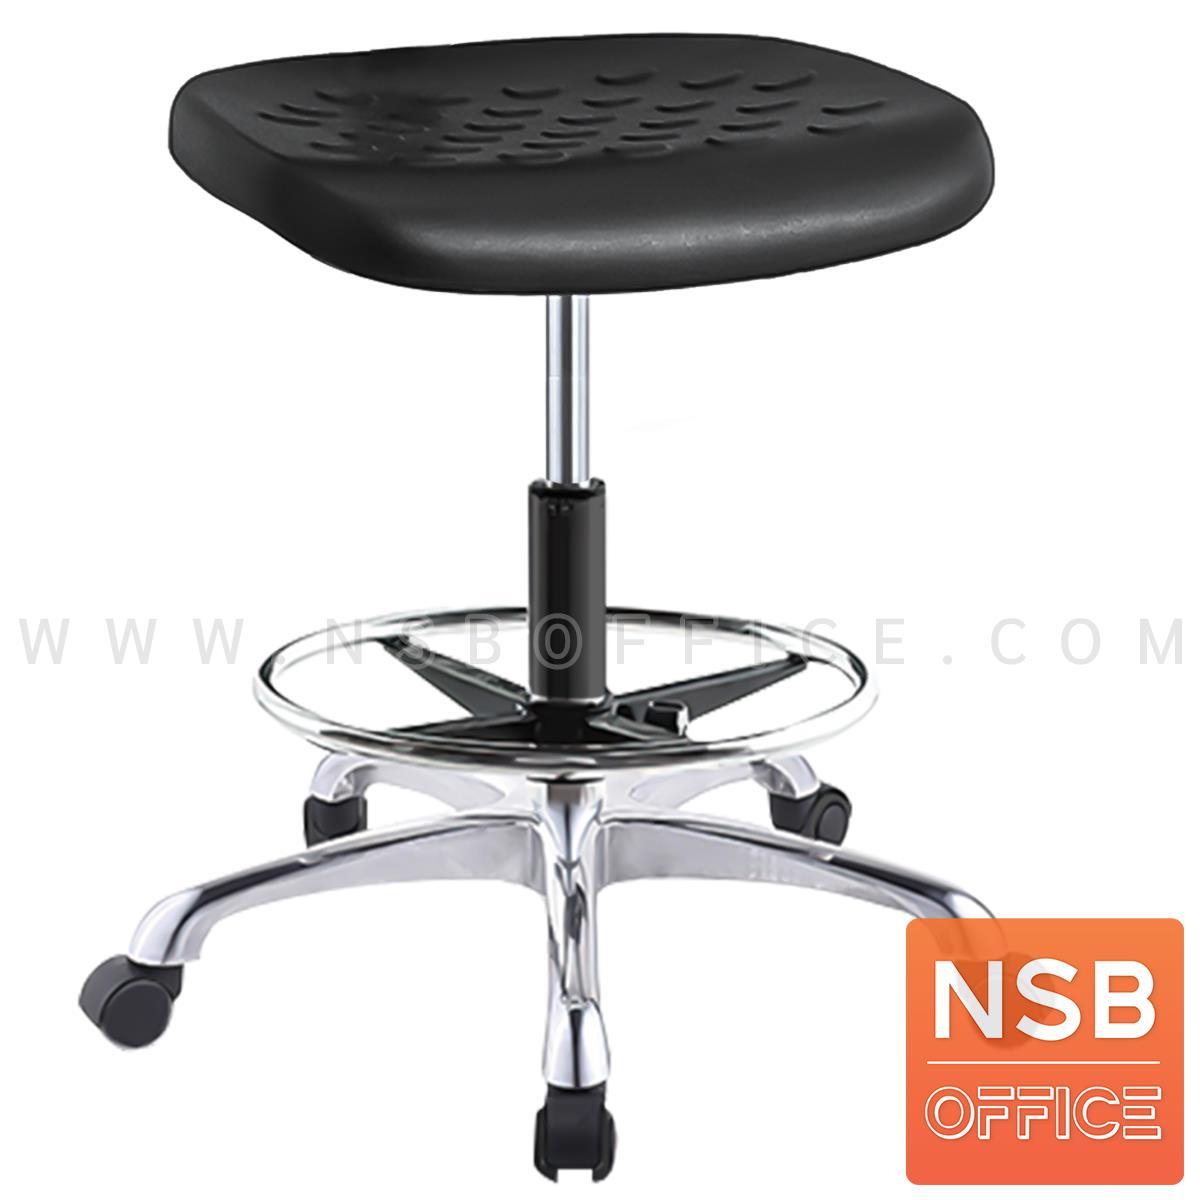 B02A112:เก้าอี้บาร์สตูลที่นั่งเหลี่ยม รุ่น Sulli (ซอลลี่) มีวงเหยียบ โช๊คแก๊ส ขาอลูมิเนียม